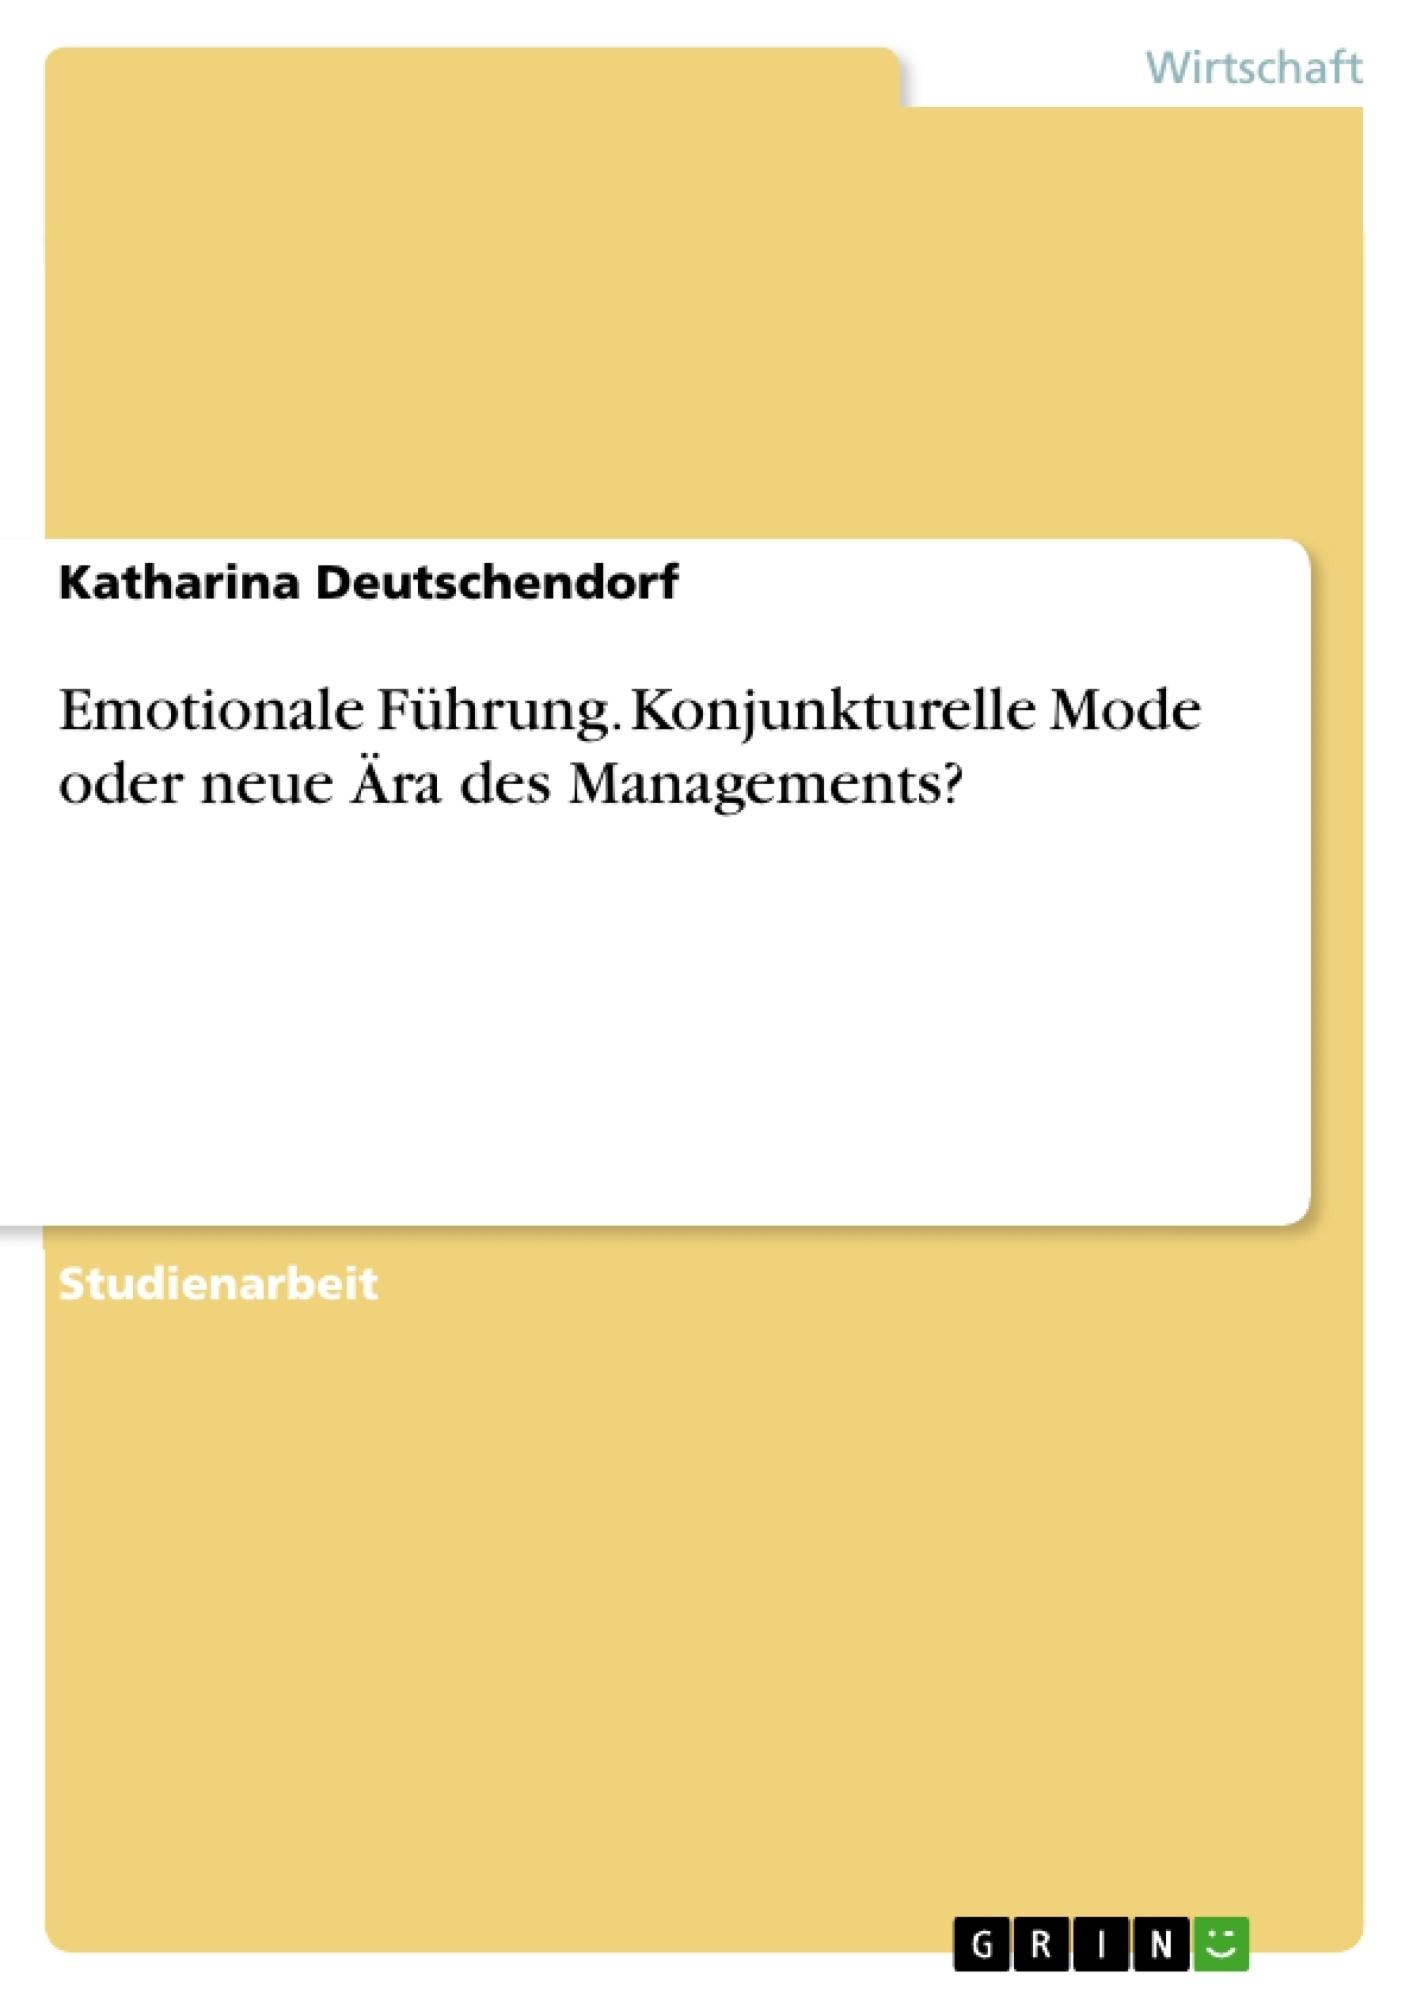 Titel: Emotionale Führung. Konjunkturelle Mode oder neue Ära des Managements?